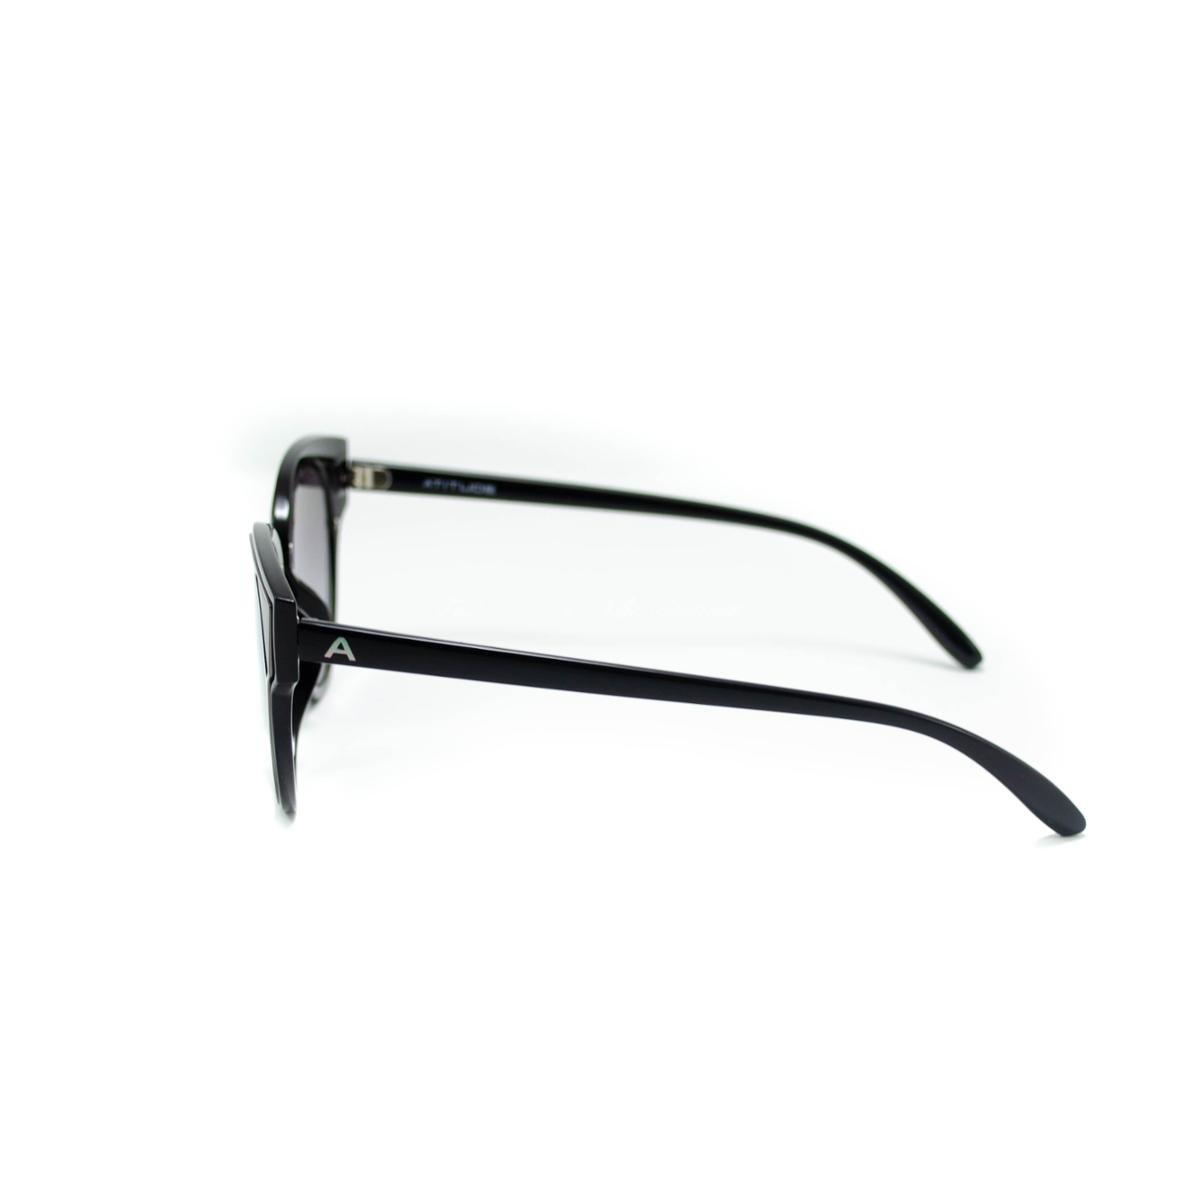 Óculos de Sol Atitude - AT5385 A01 - Preto - Compre Agora   Zattini aa94d27dca